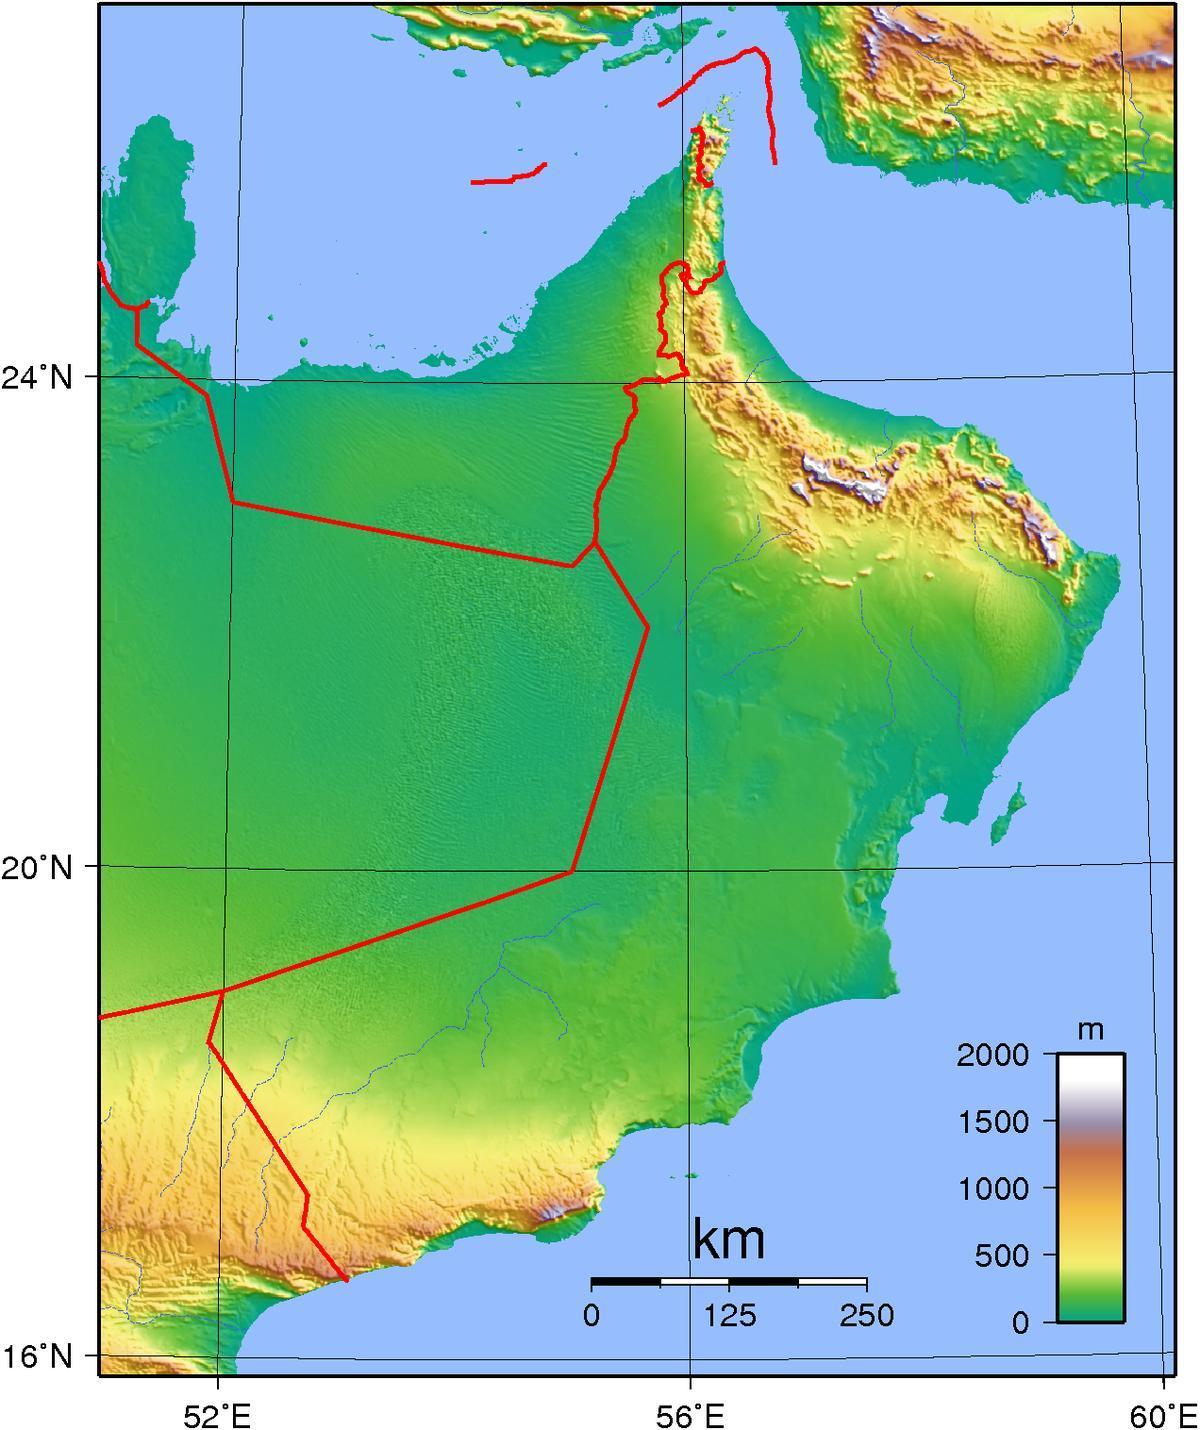 Asia Occidentale Cartina Politica.Oman Cartina Geografica Cartina Di Oman Geografiche Asia